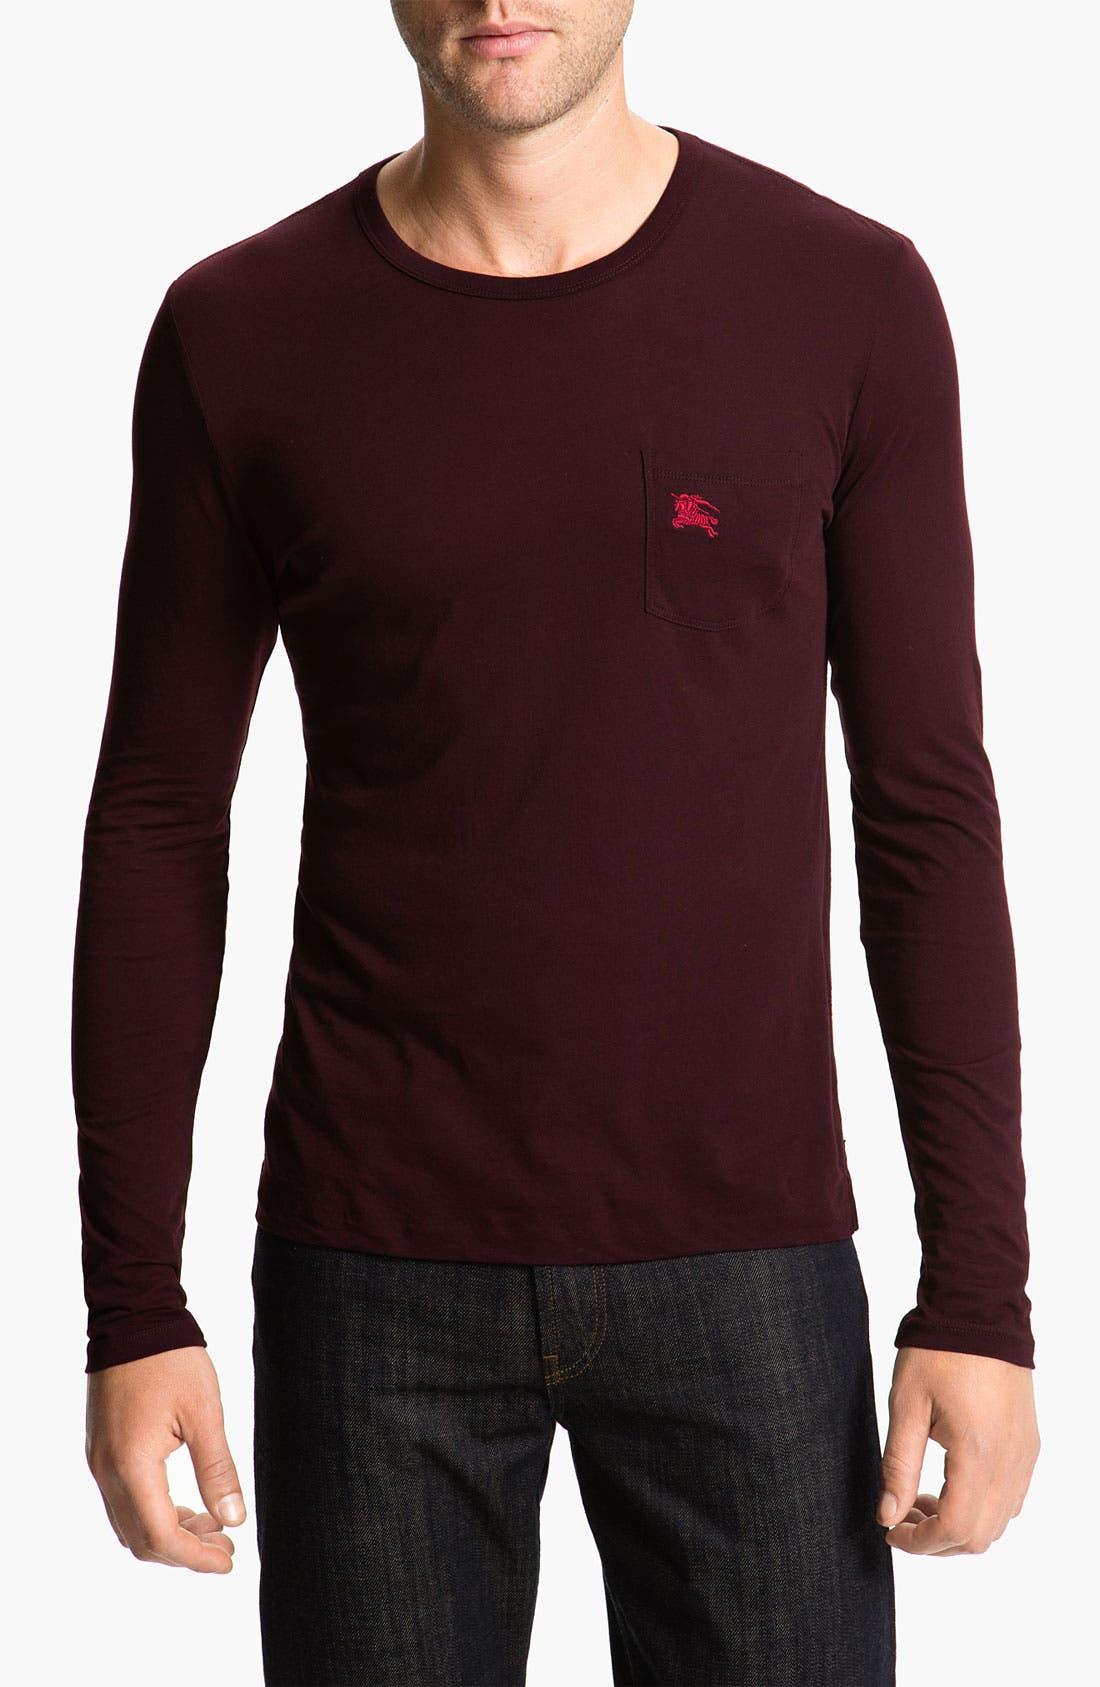 Main Image - Burberry Brit Long Sleeve T-Shirt